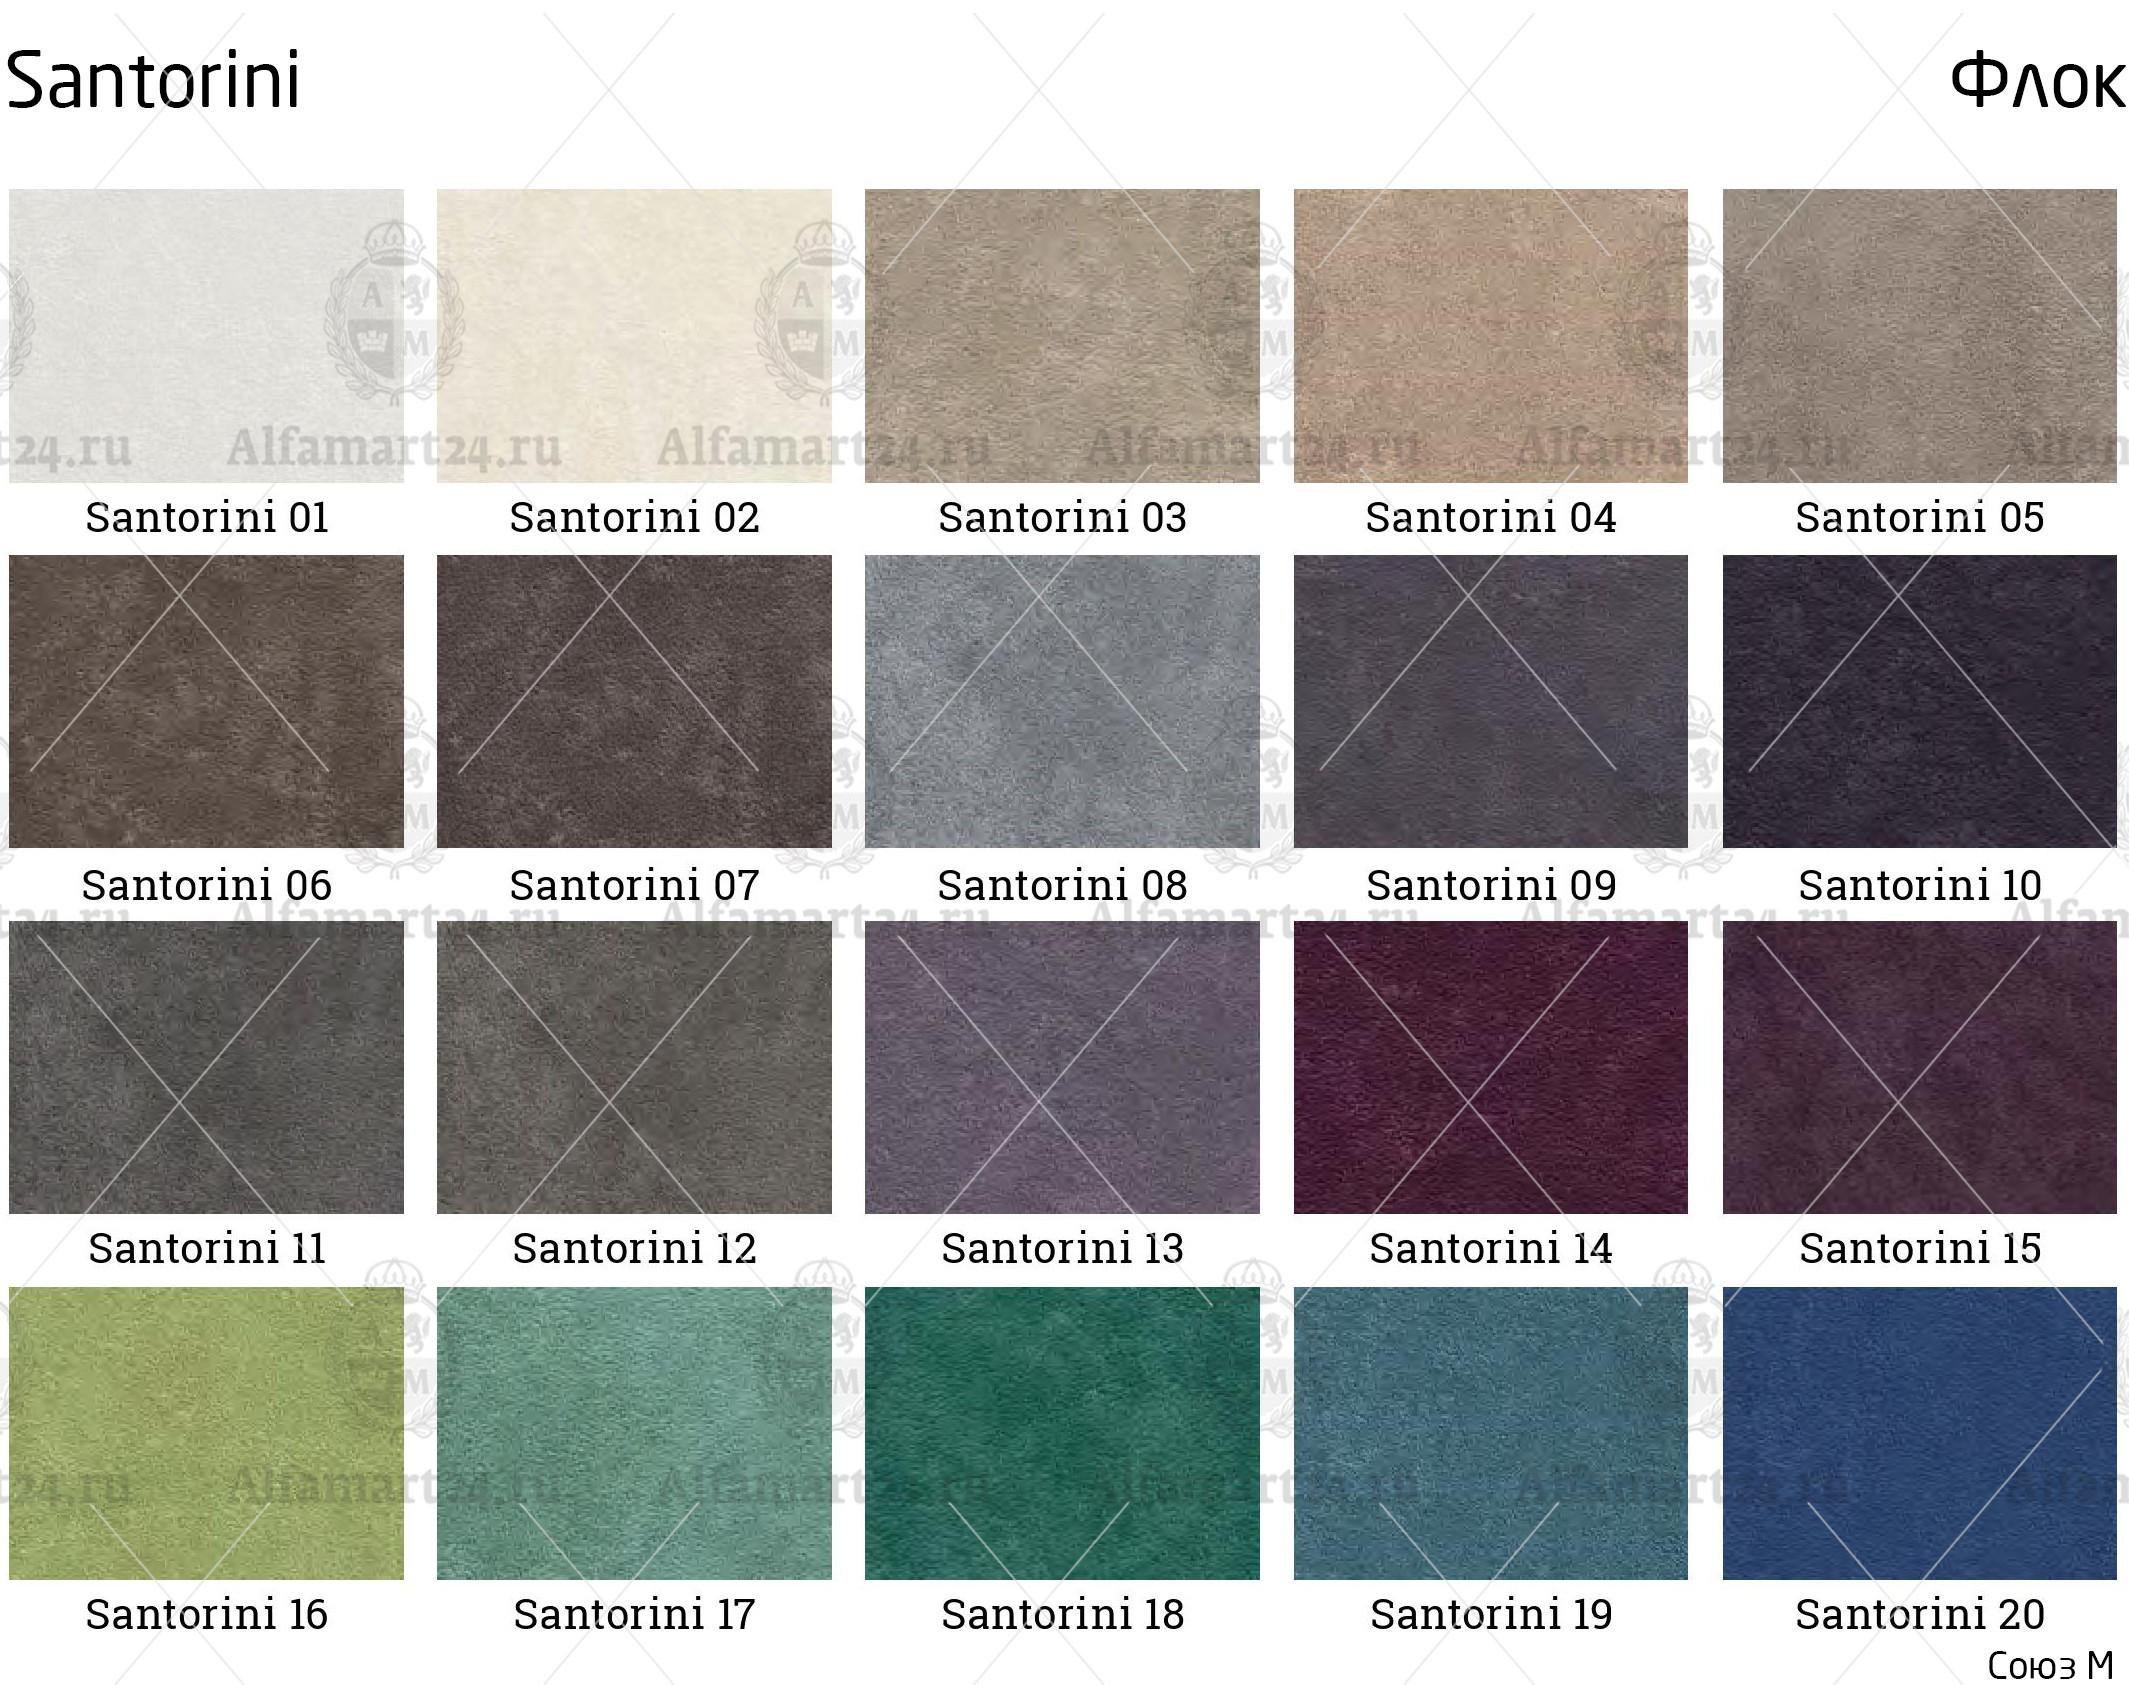 Santorini (флок) Союз М